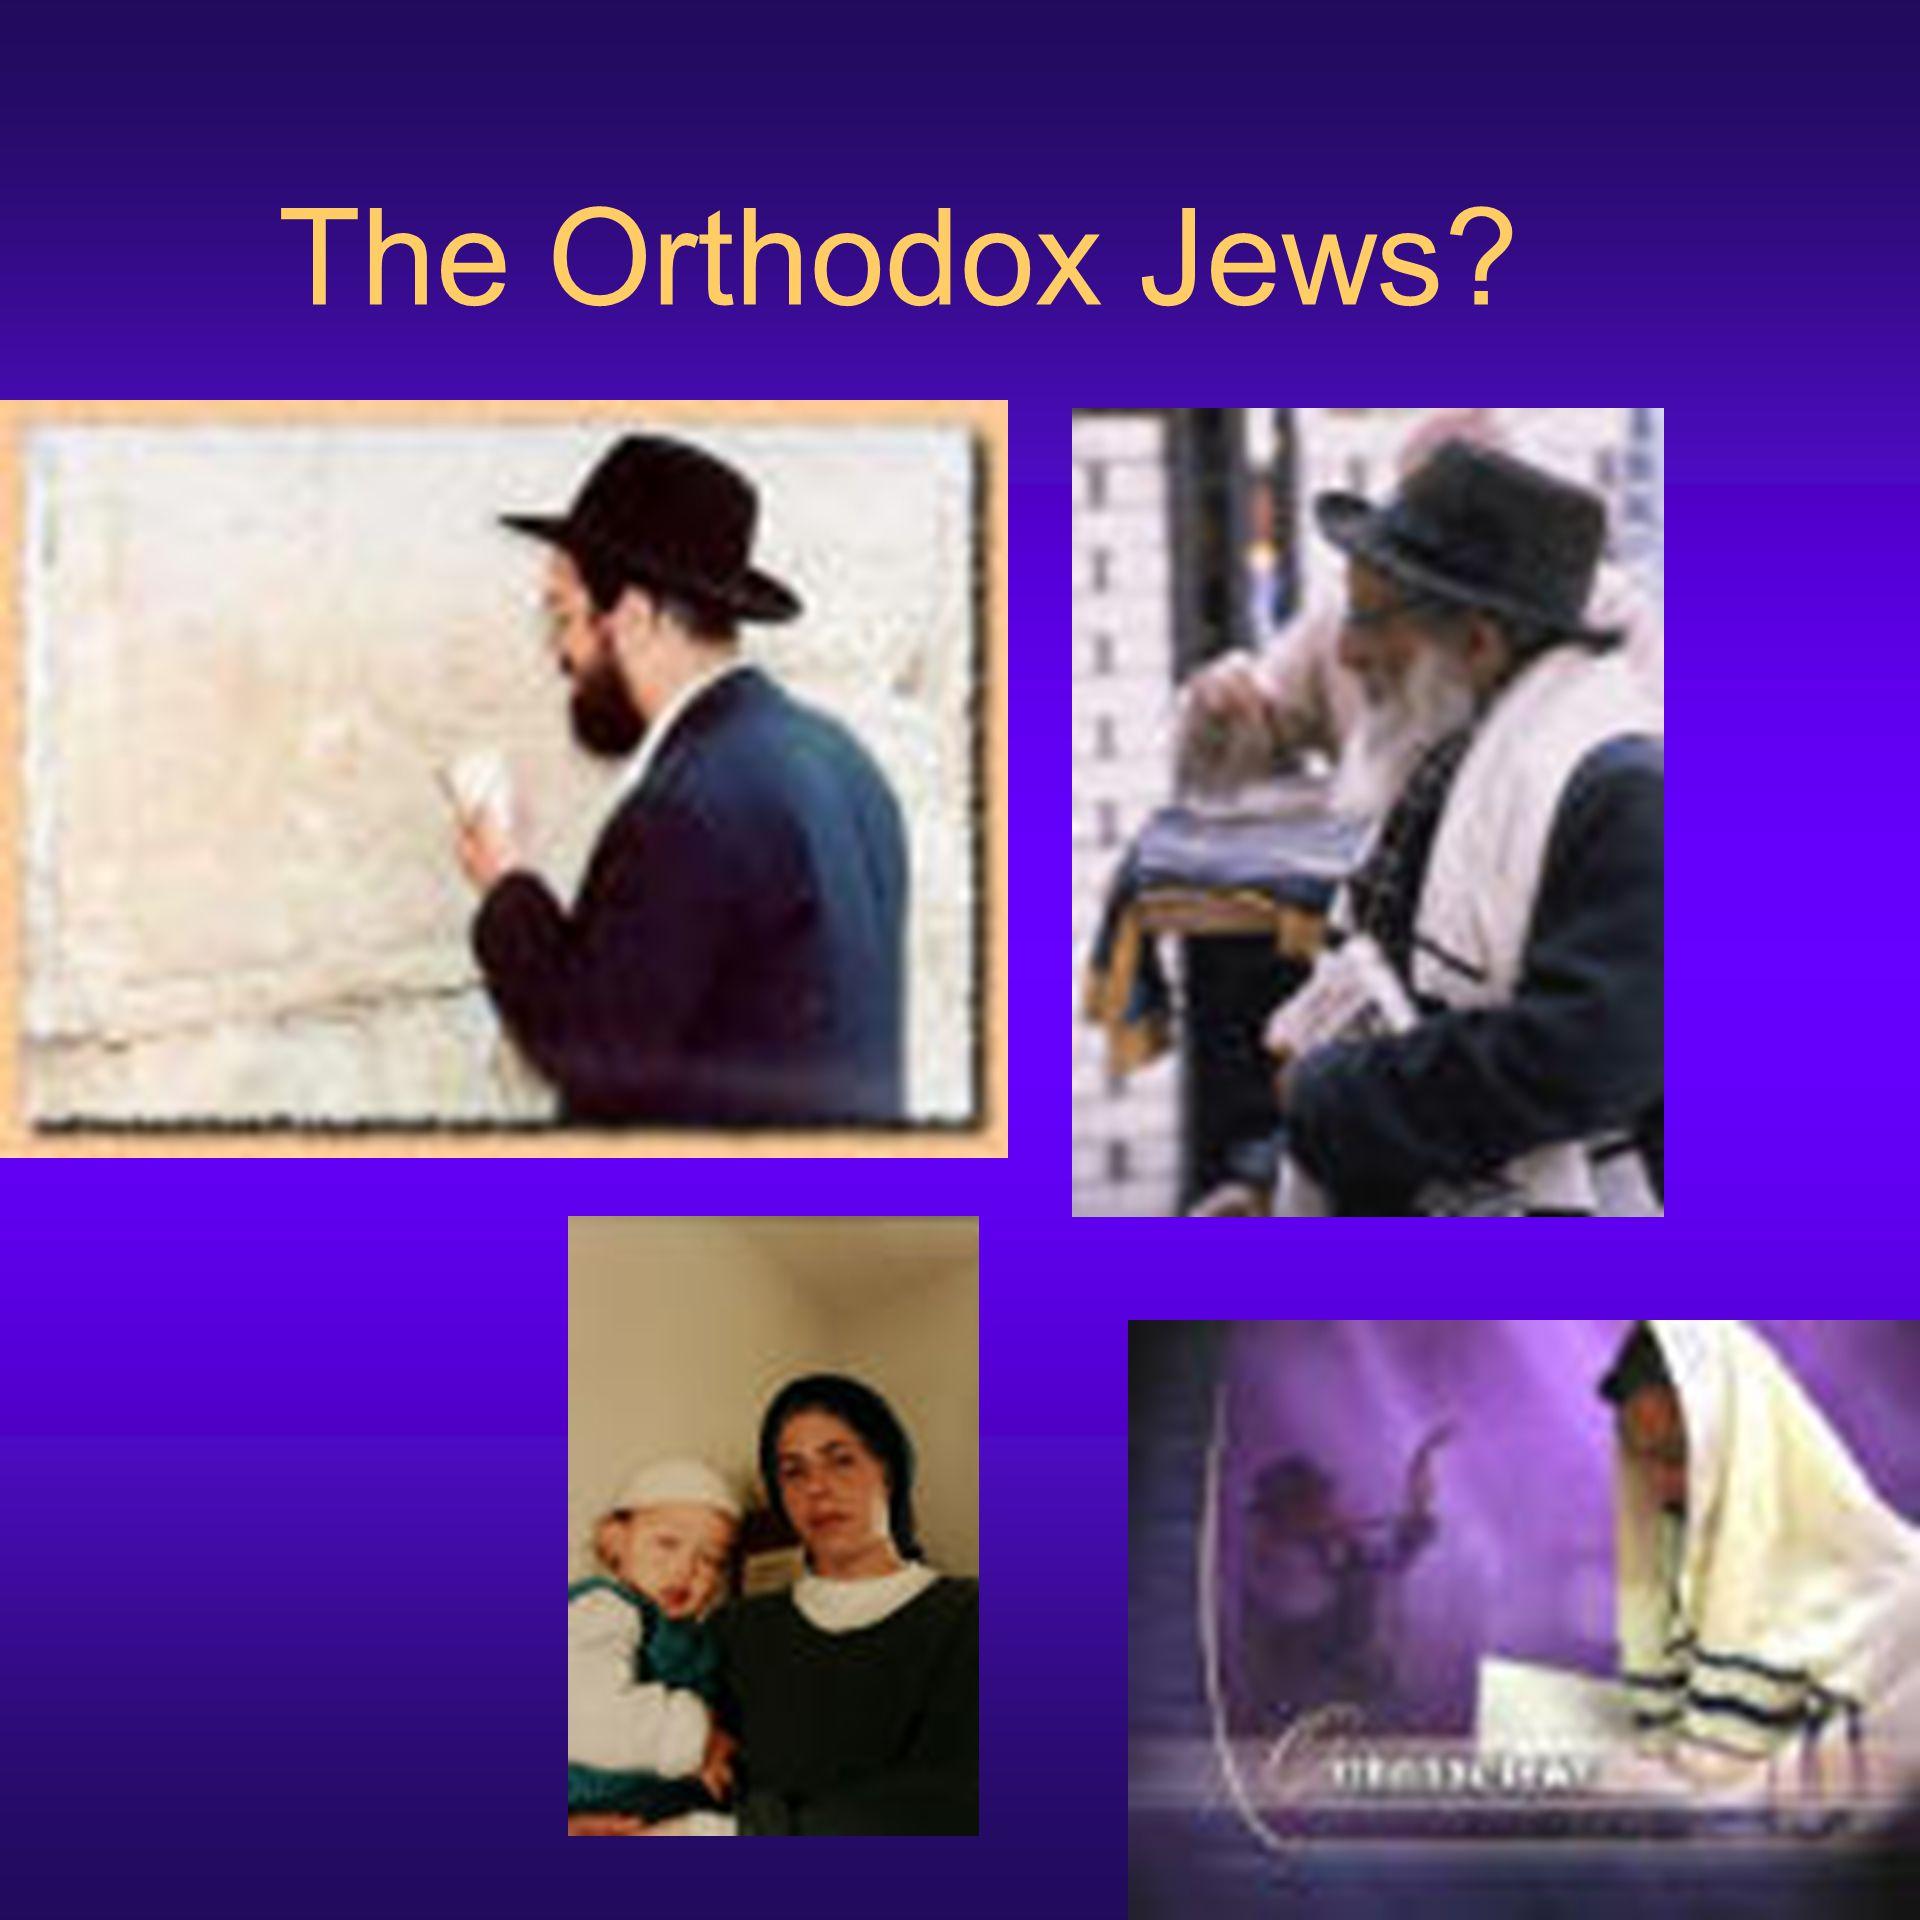 The Orthodox Jews?